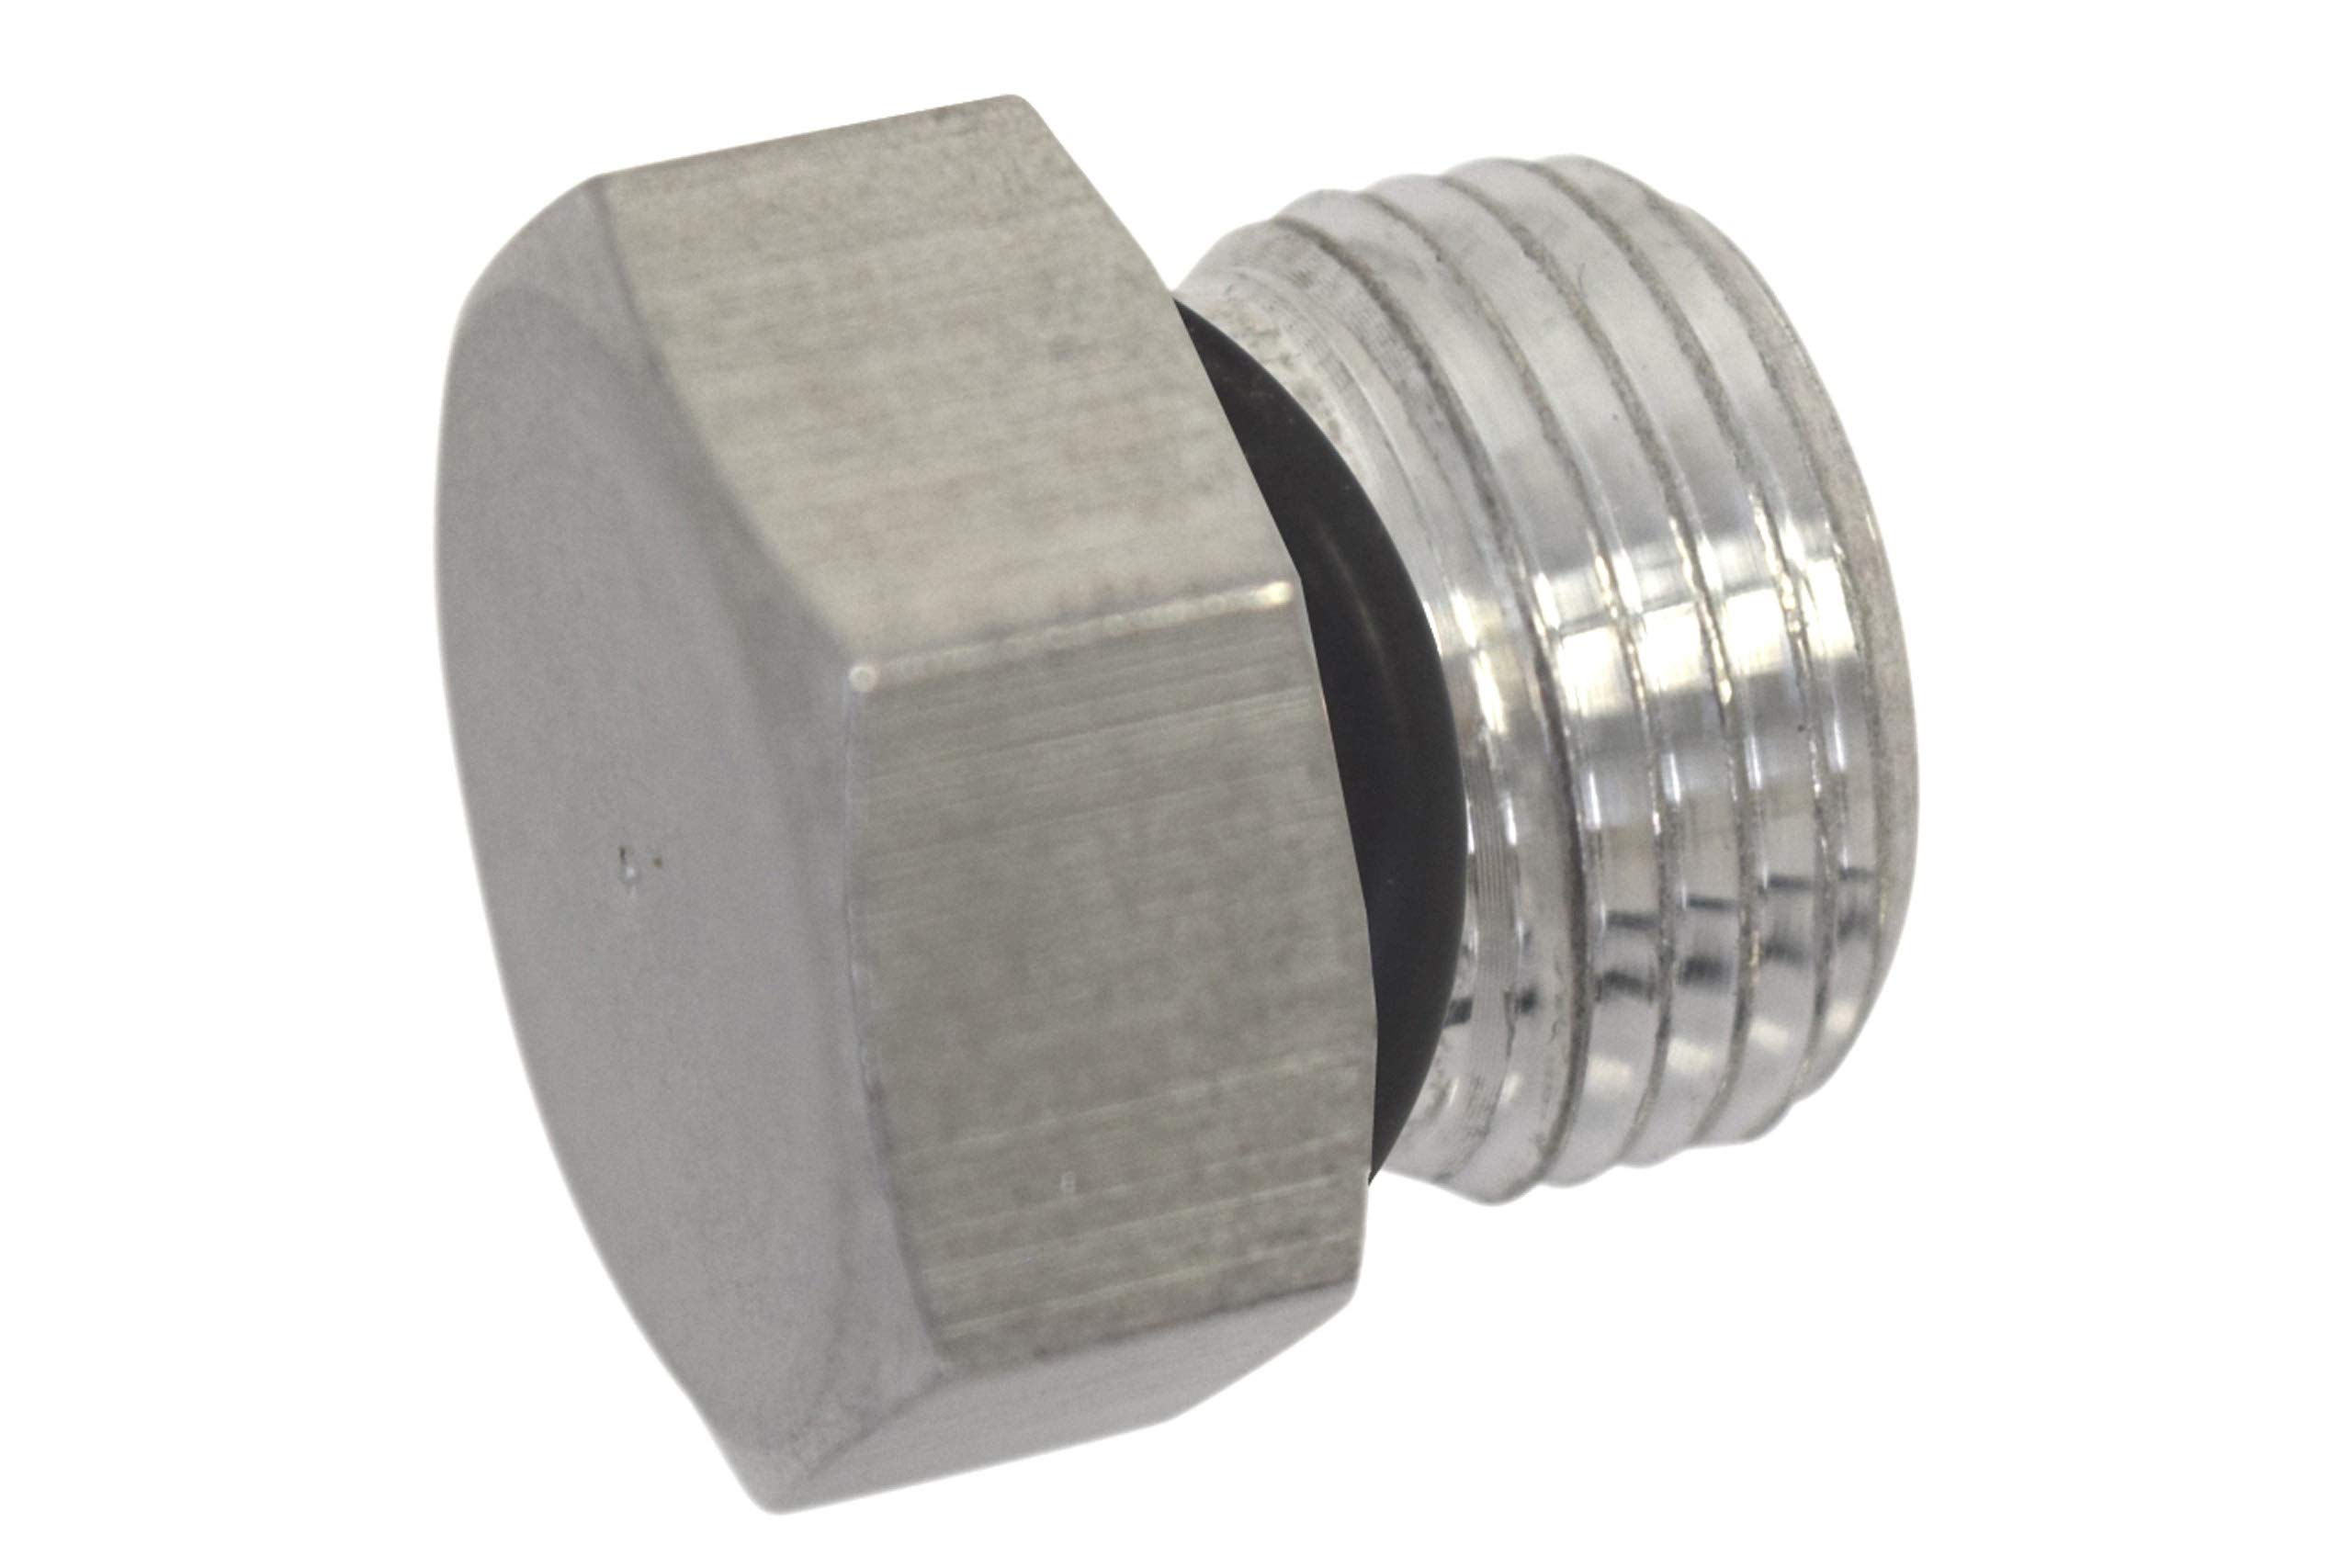 ICT Billet -8AN ORB Straight Thread Plug Male Nut Cap Fitting Aluminum AN814-08A